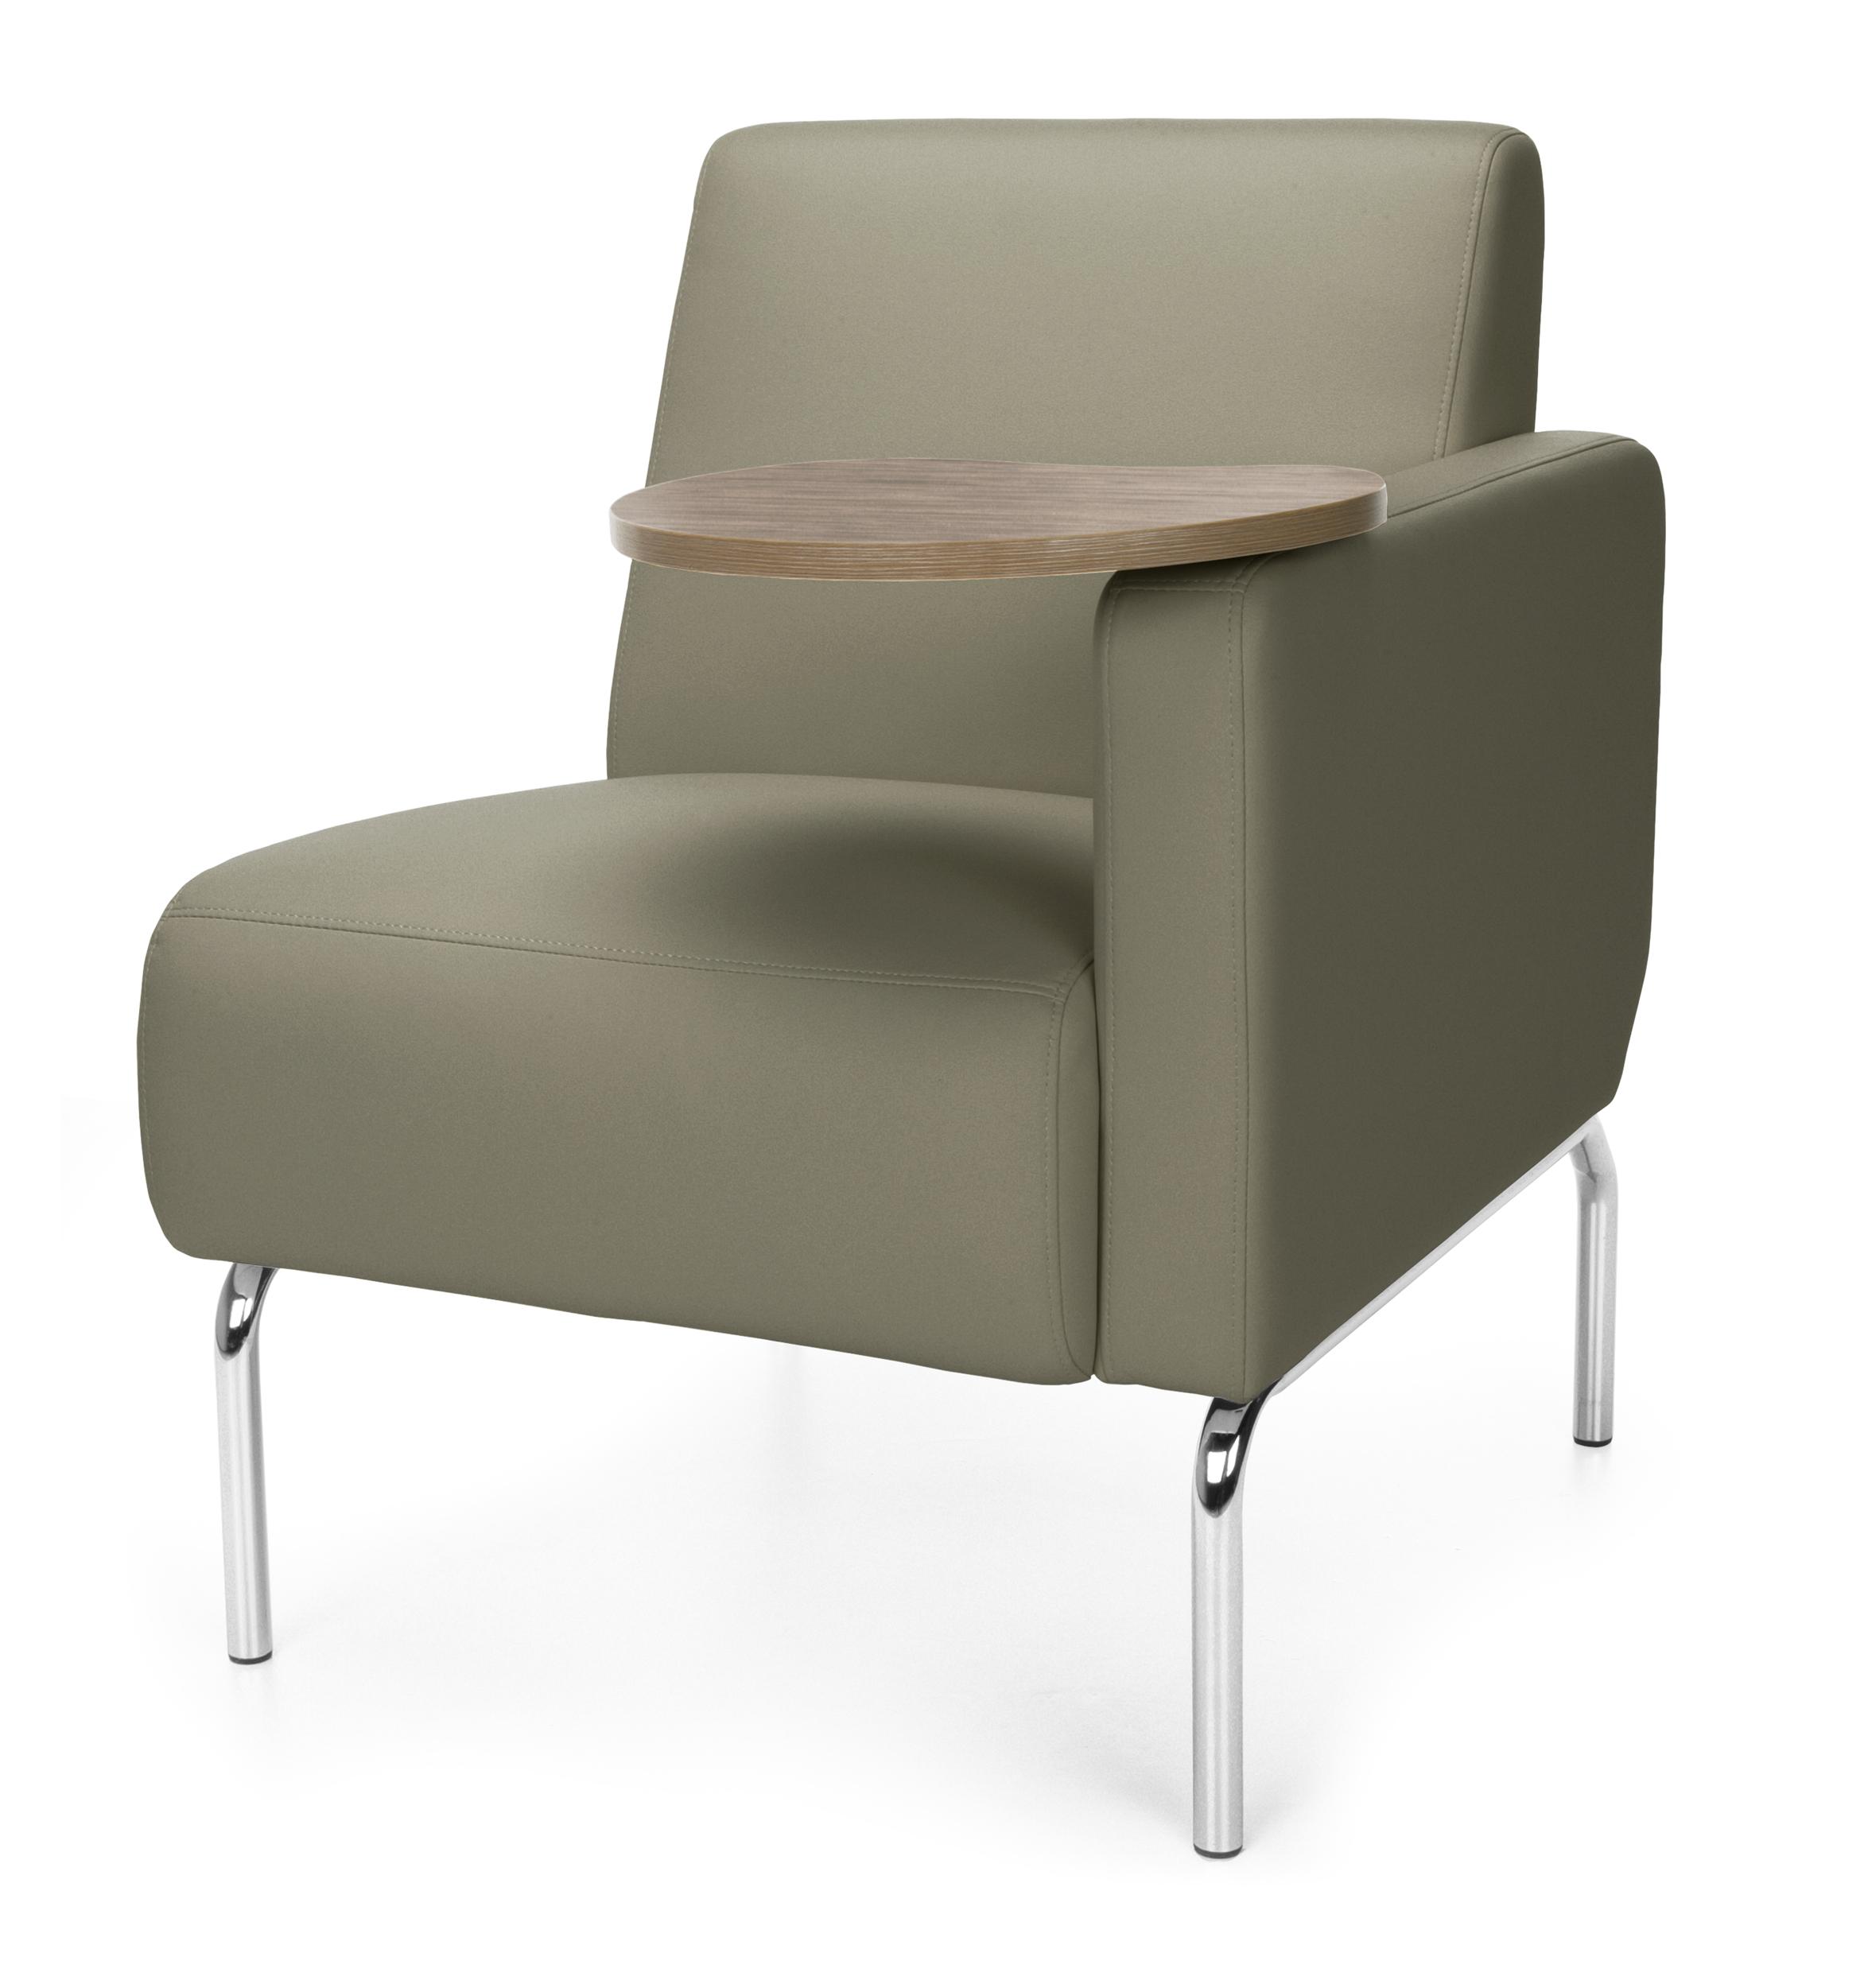 ofm triumph series lounge chair nashville office furniture cherryman l desk with hanging pedestals amber series